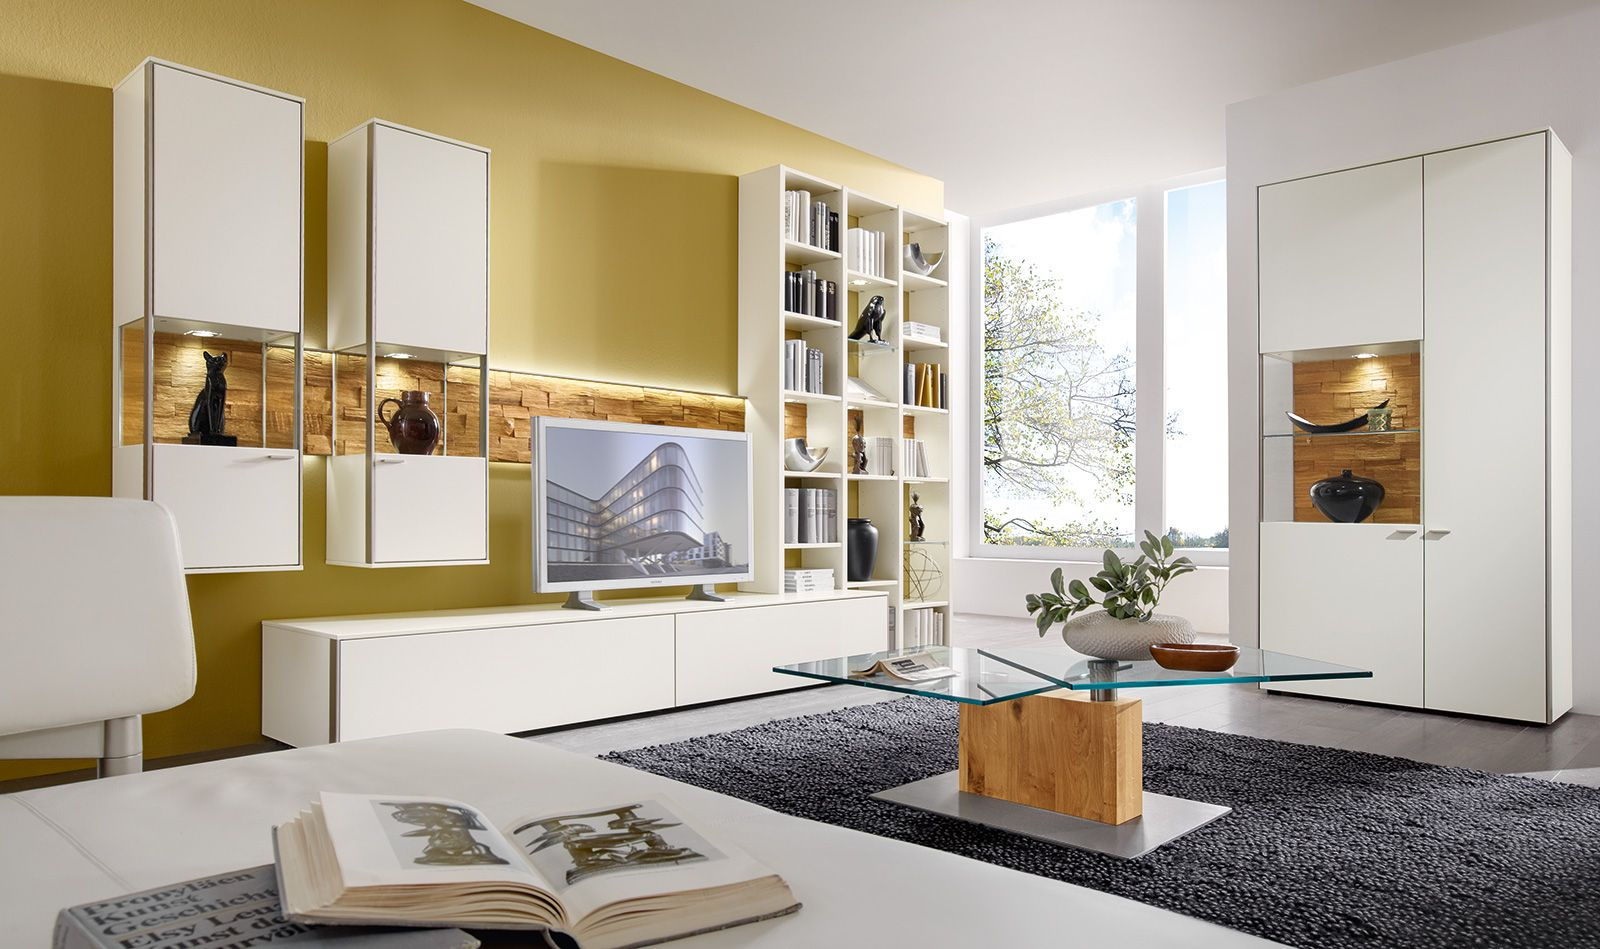 sentino programme wohnzimmer venjakob m bel ideen rund ums wohnen wohnzimmer venjakob. Black Bedroom Furniture Sets. Home Design Ideas